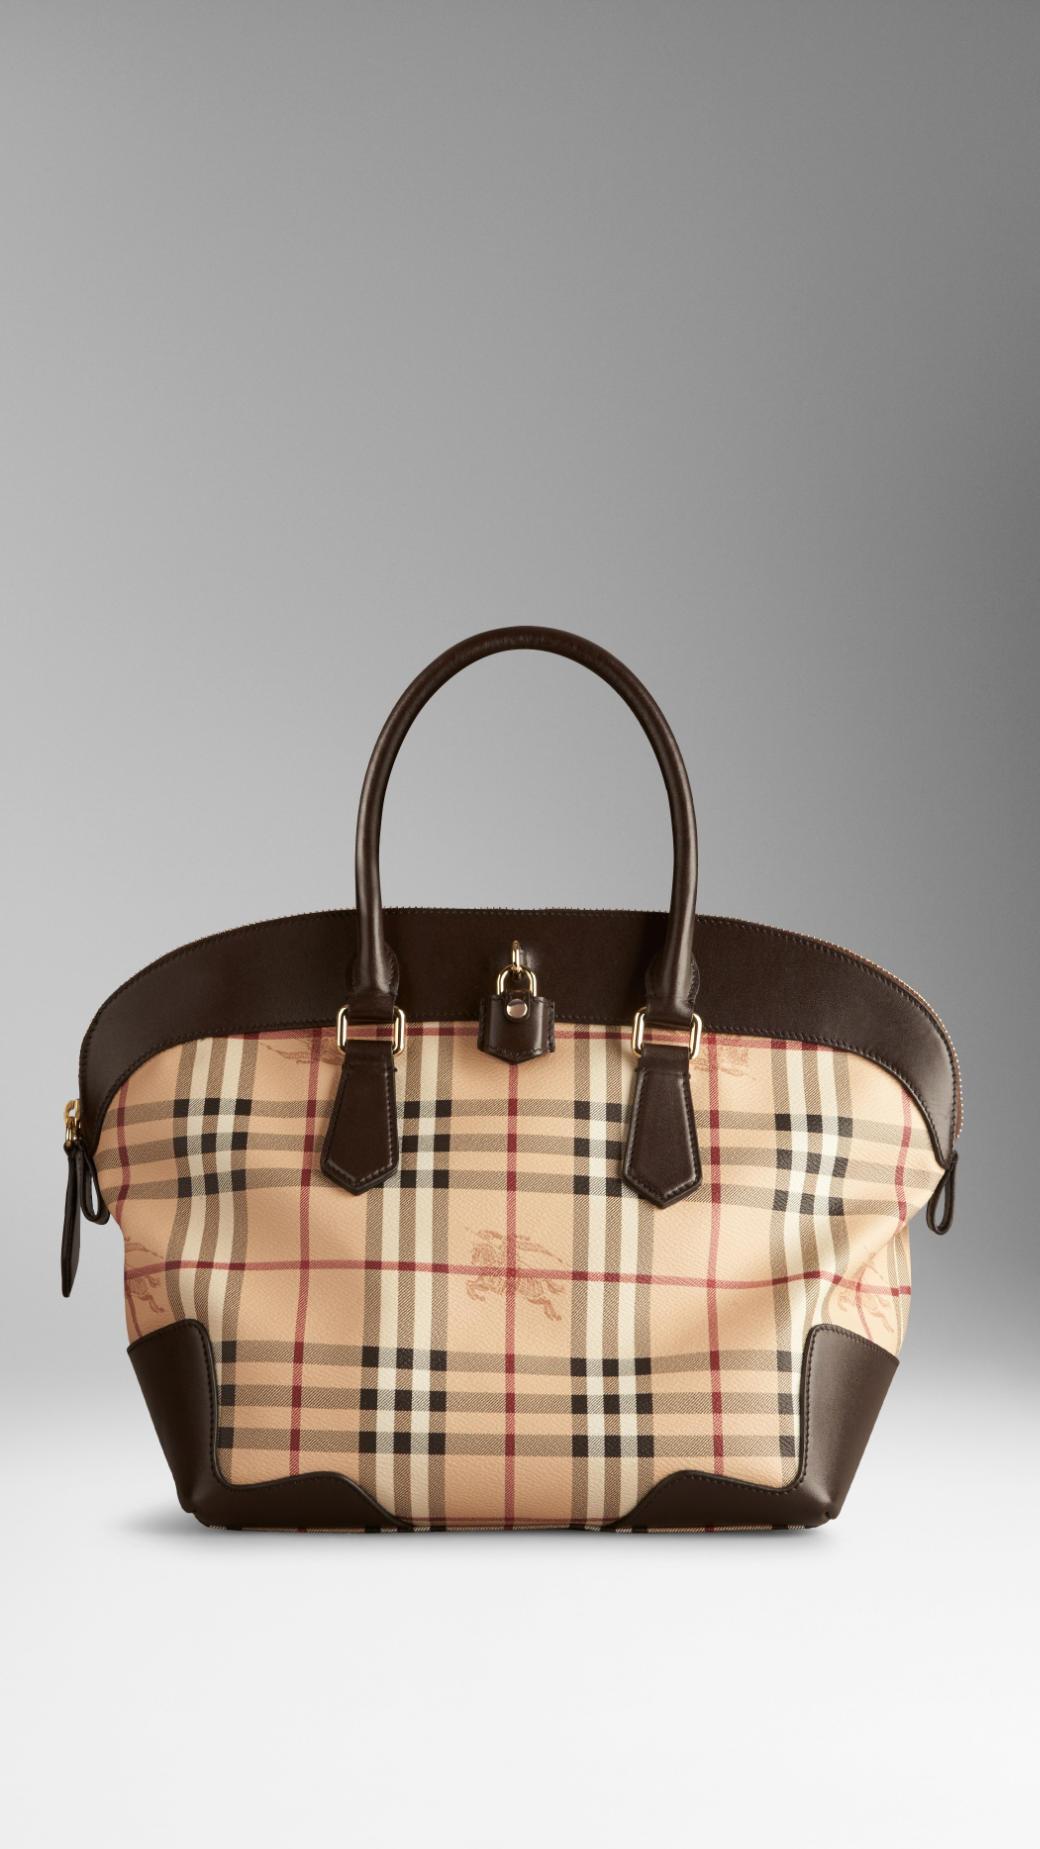 Lyst - Burberry Medium Haymarket Check Tote Bag in Brown 823bd254f9d4a